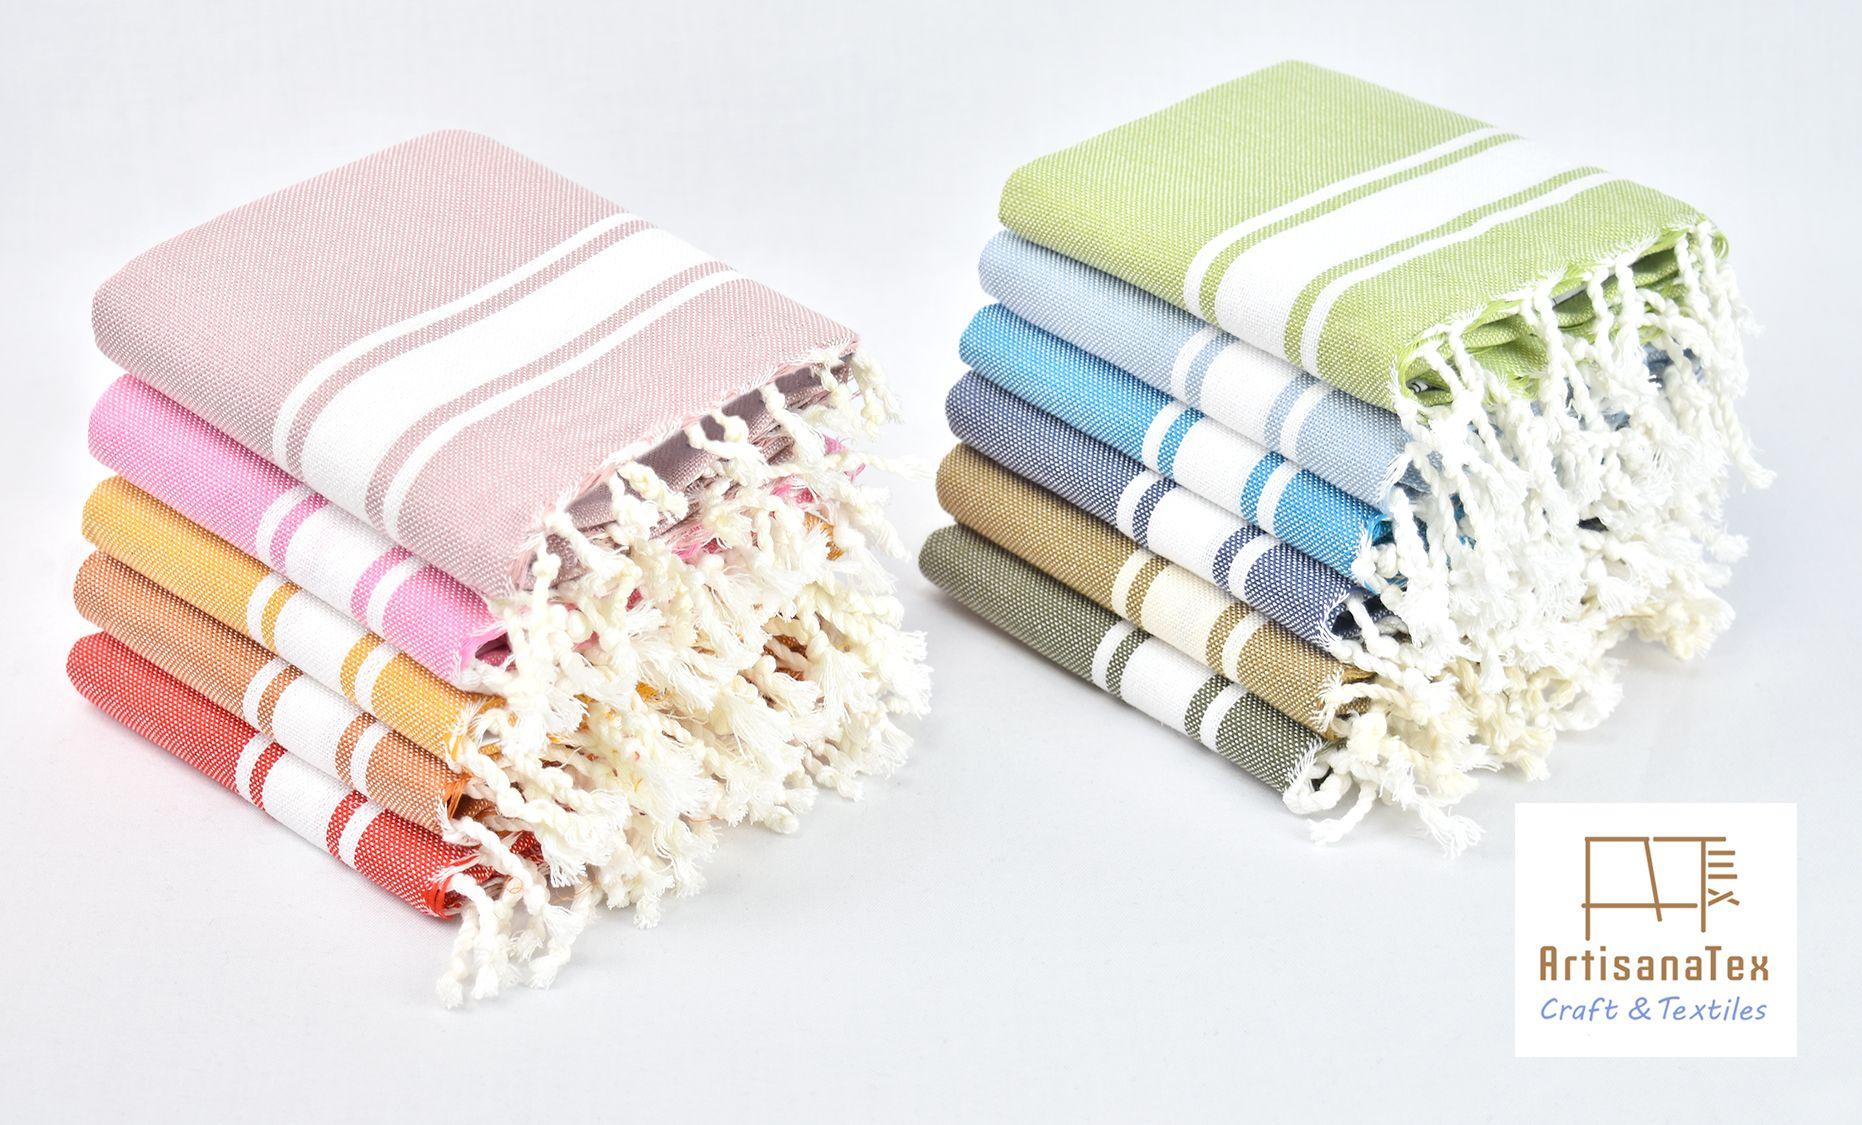 Serviette Artisanat Napkin Craft Textile Fouta Jete Tunuisia Artisanat Serviettes Craft